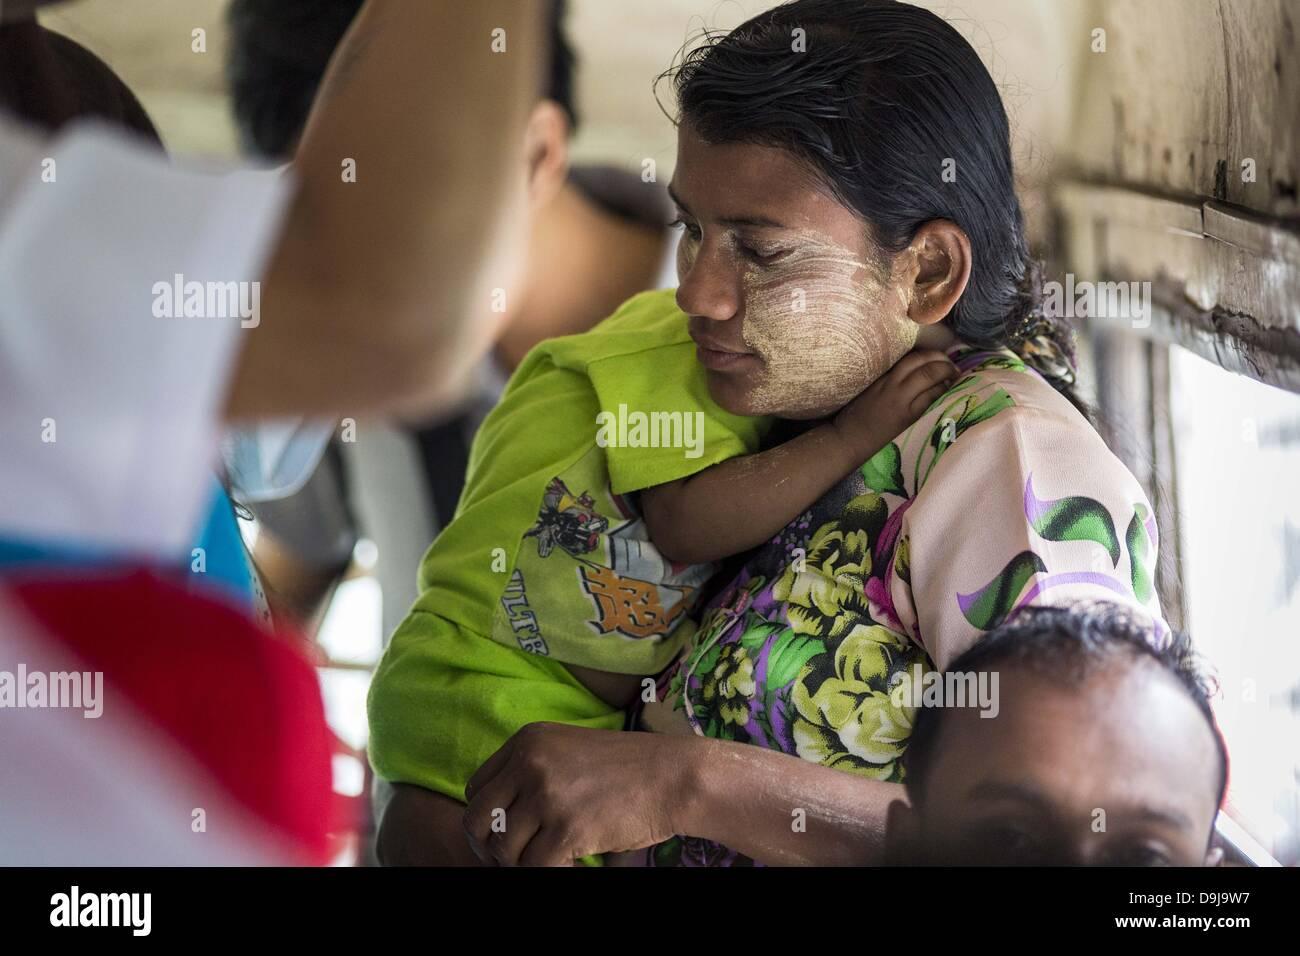 June 19, 2013 - Yangon, Union of Myanmar - A woman with